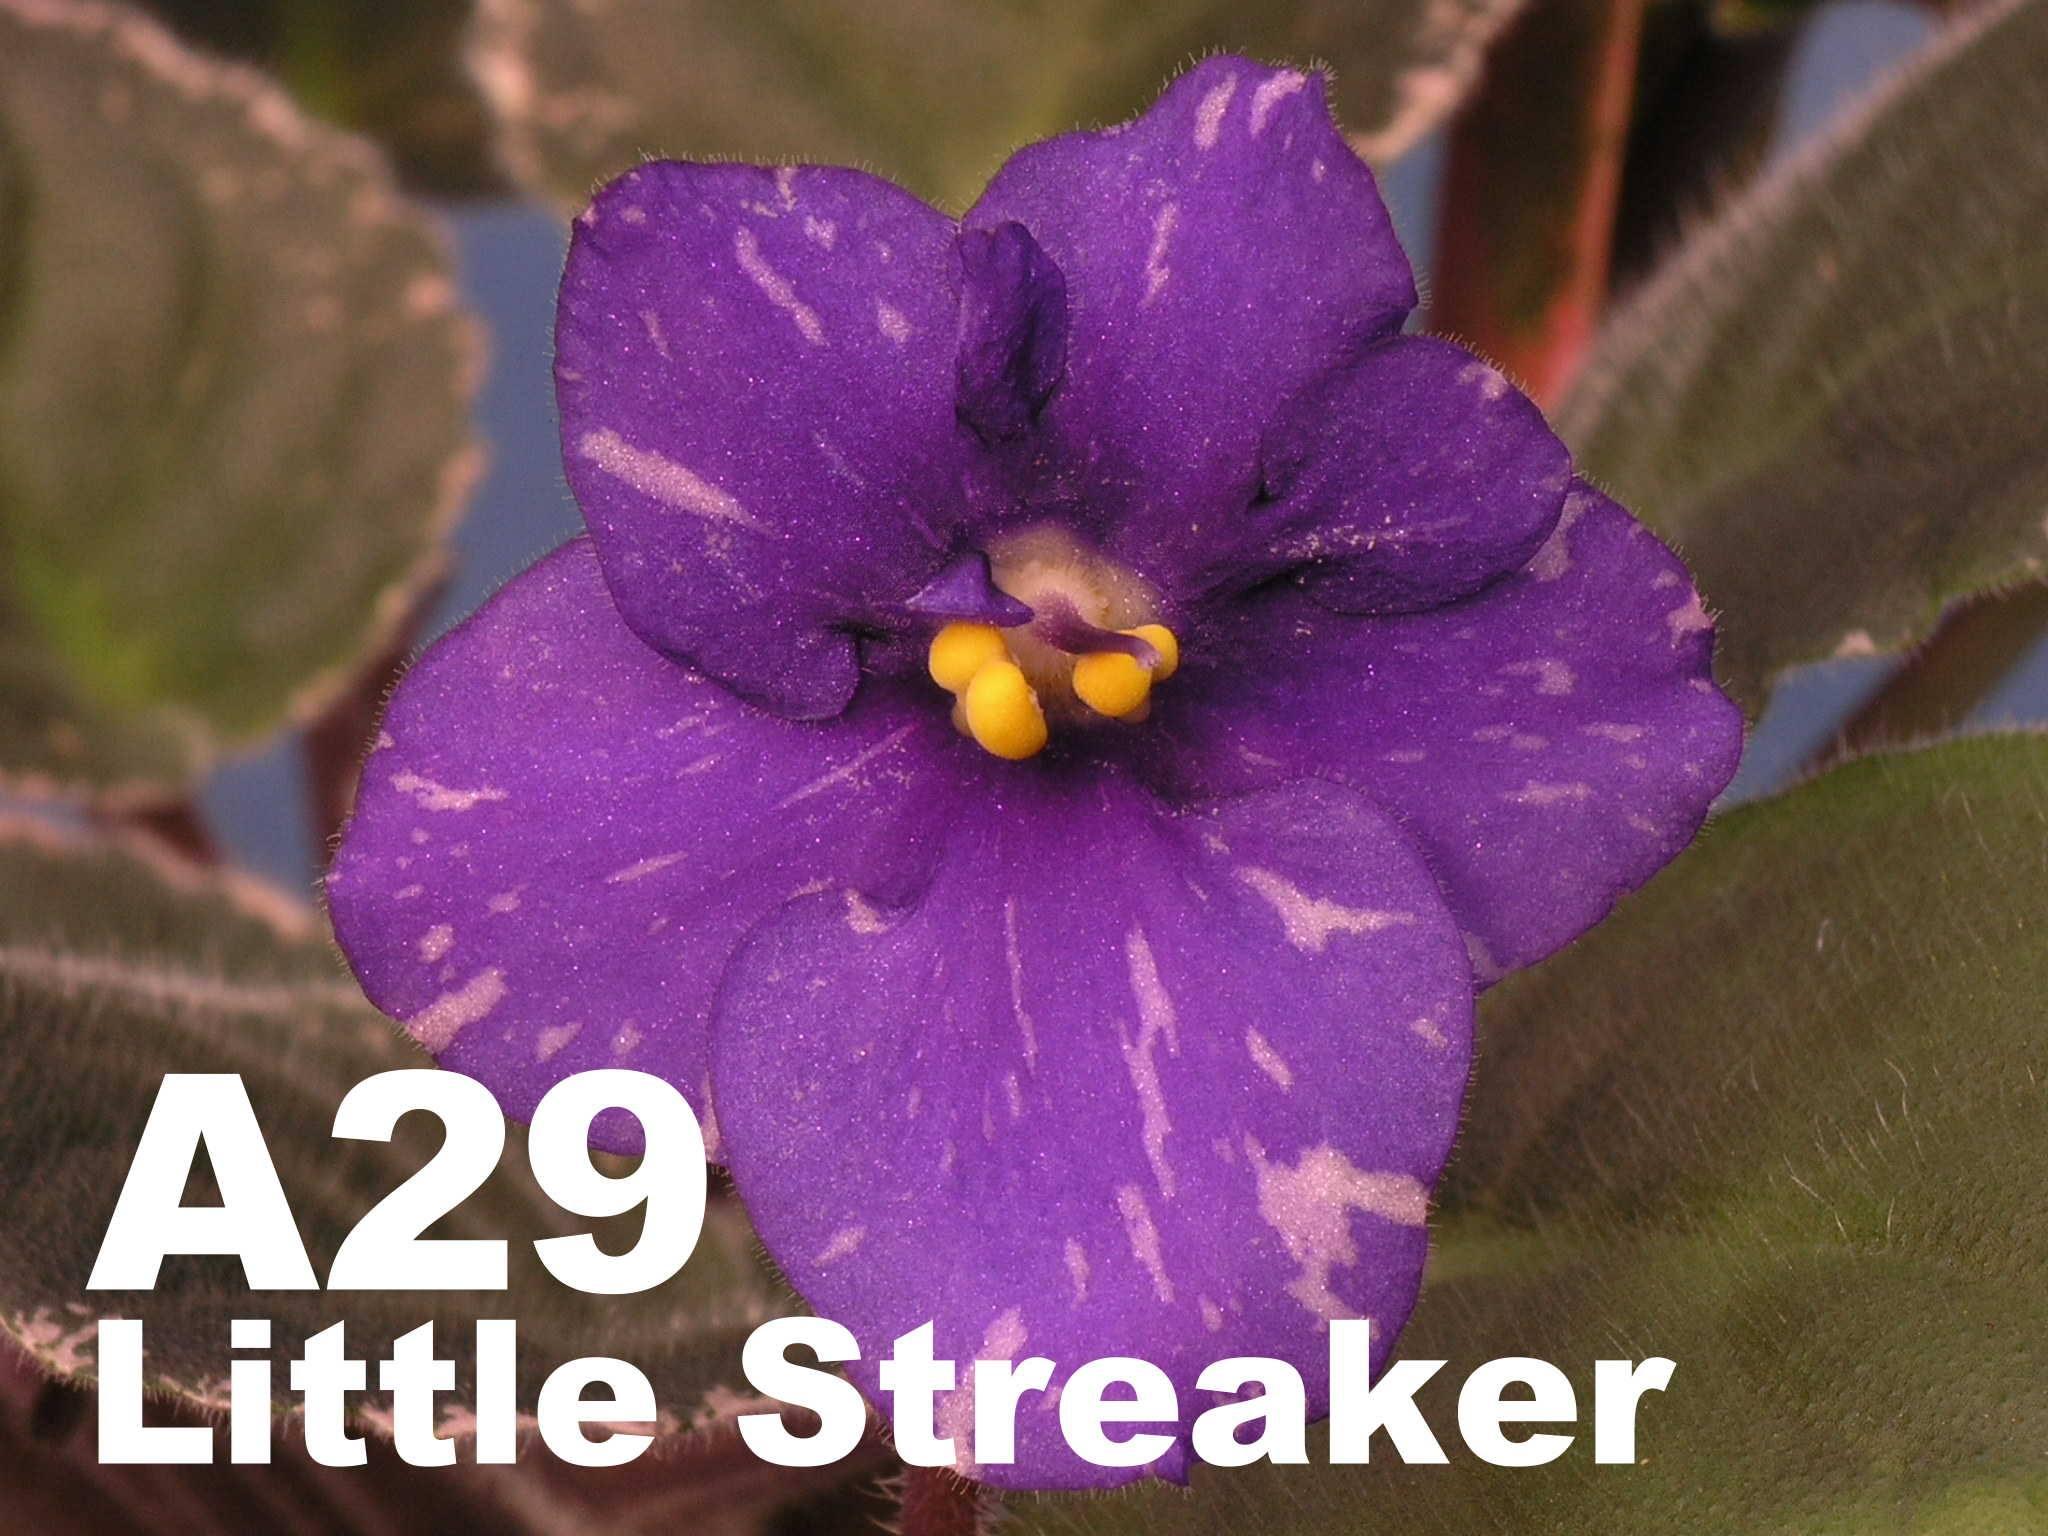 [A29] Little Streaker A29